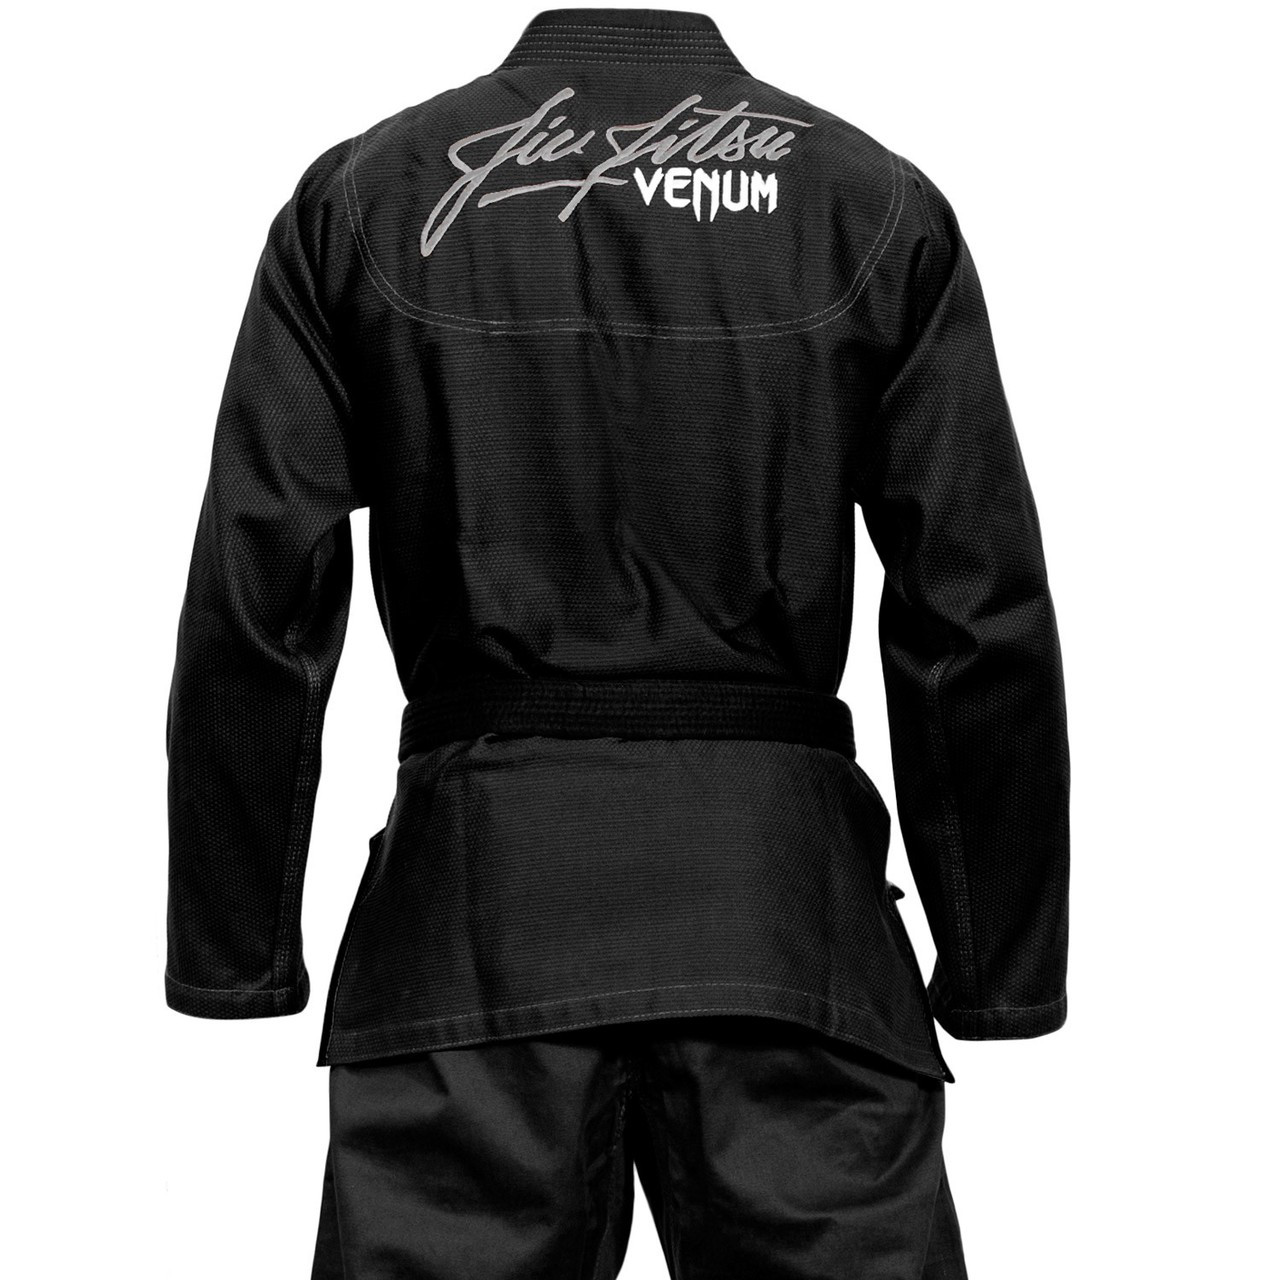 back view of the Venum challenger 3.0 BJJ Gi Black/Grey Available at www.thejiujitsushop.com  Enjoy Free Shipping from The Jiu Jitsu Shop today!